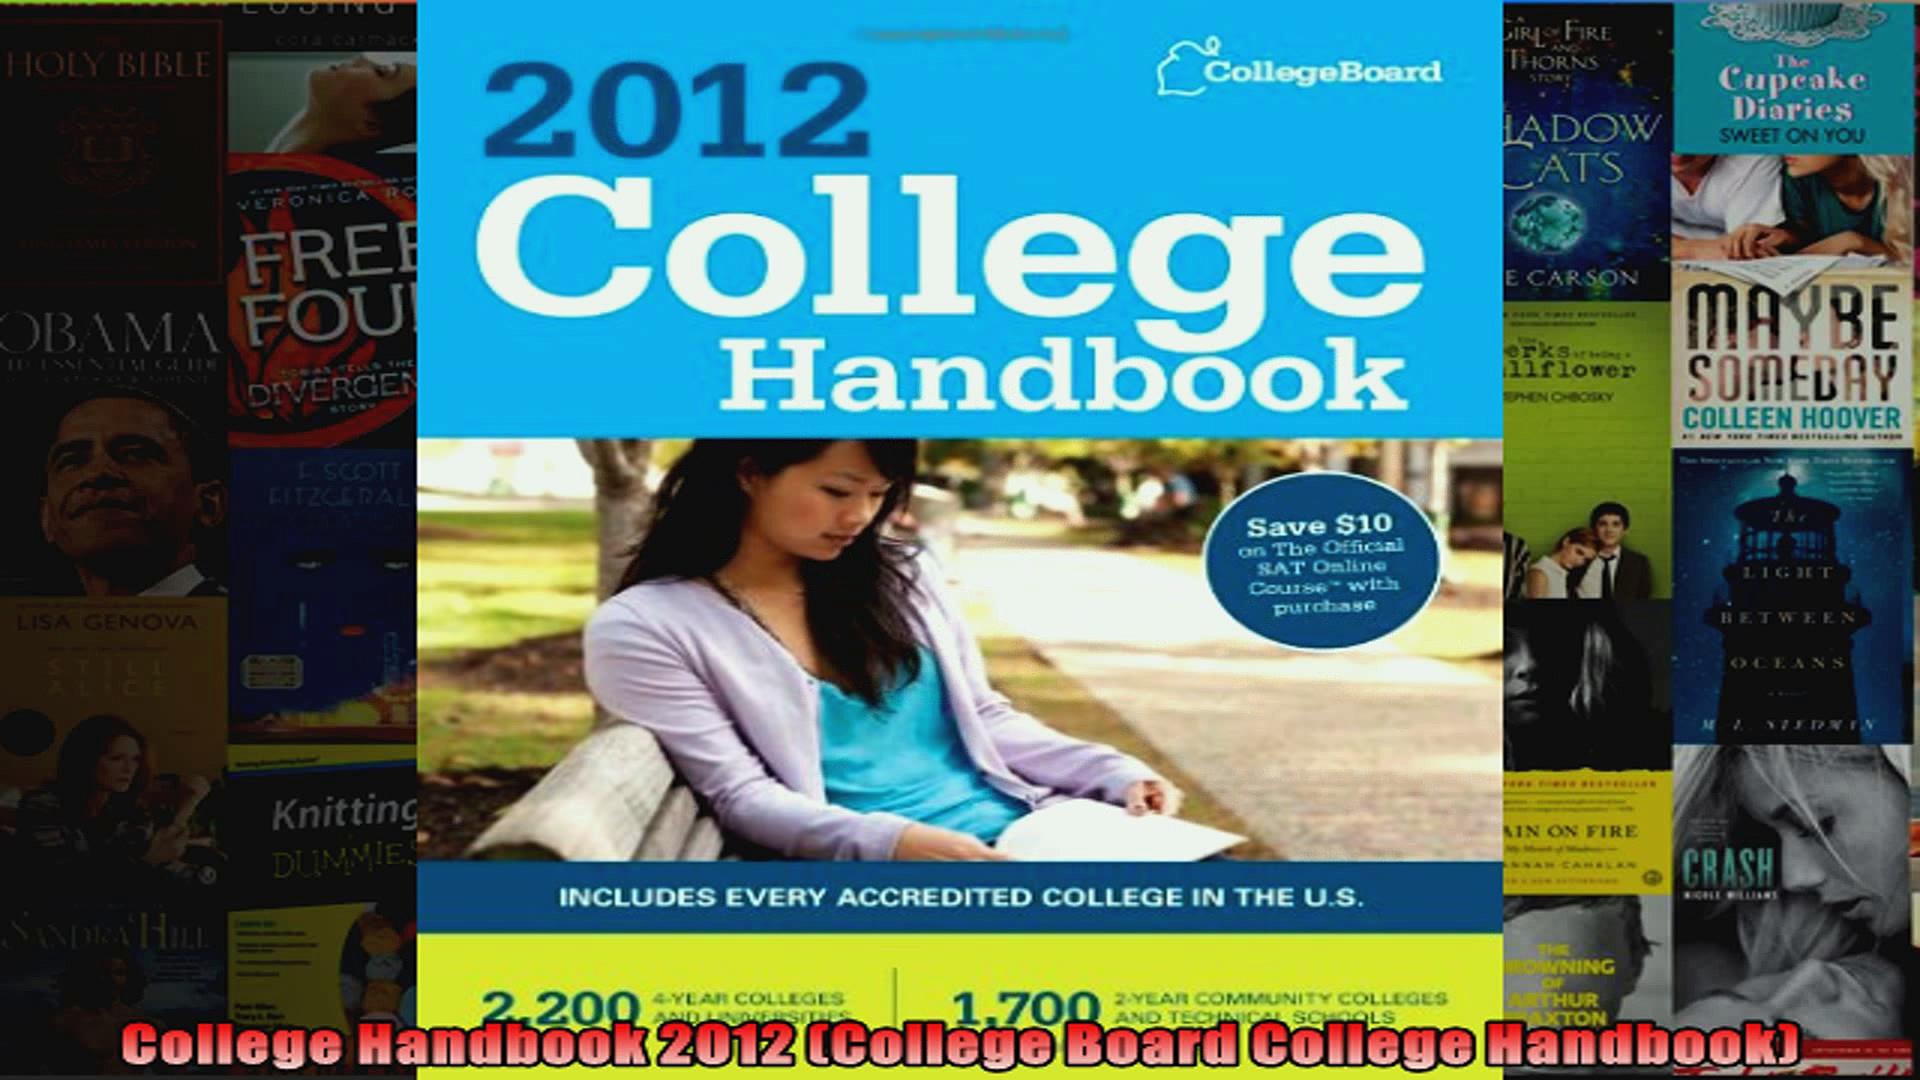 College Handbook 2012 College Board College Handbook